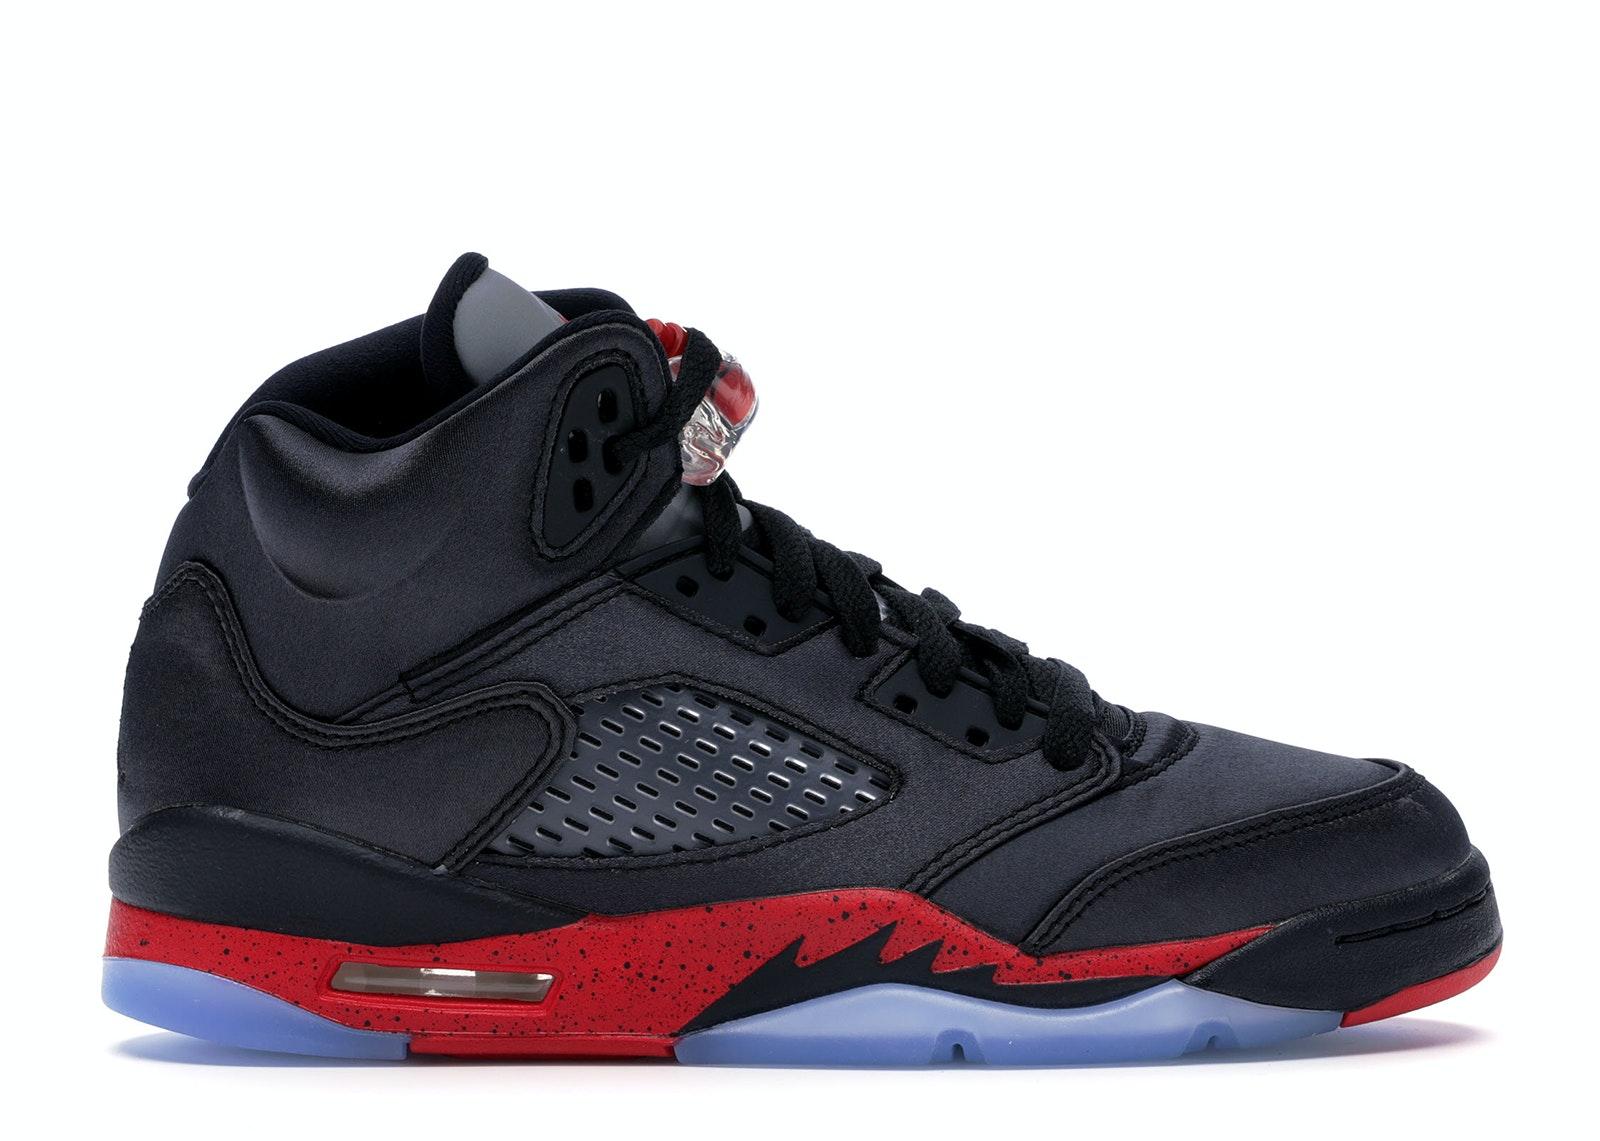 Jordan 5 Retro Satin Bred (GS)